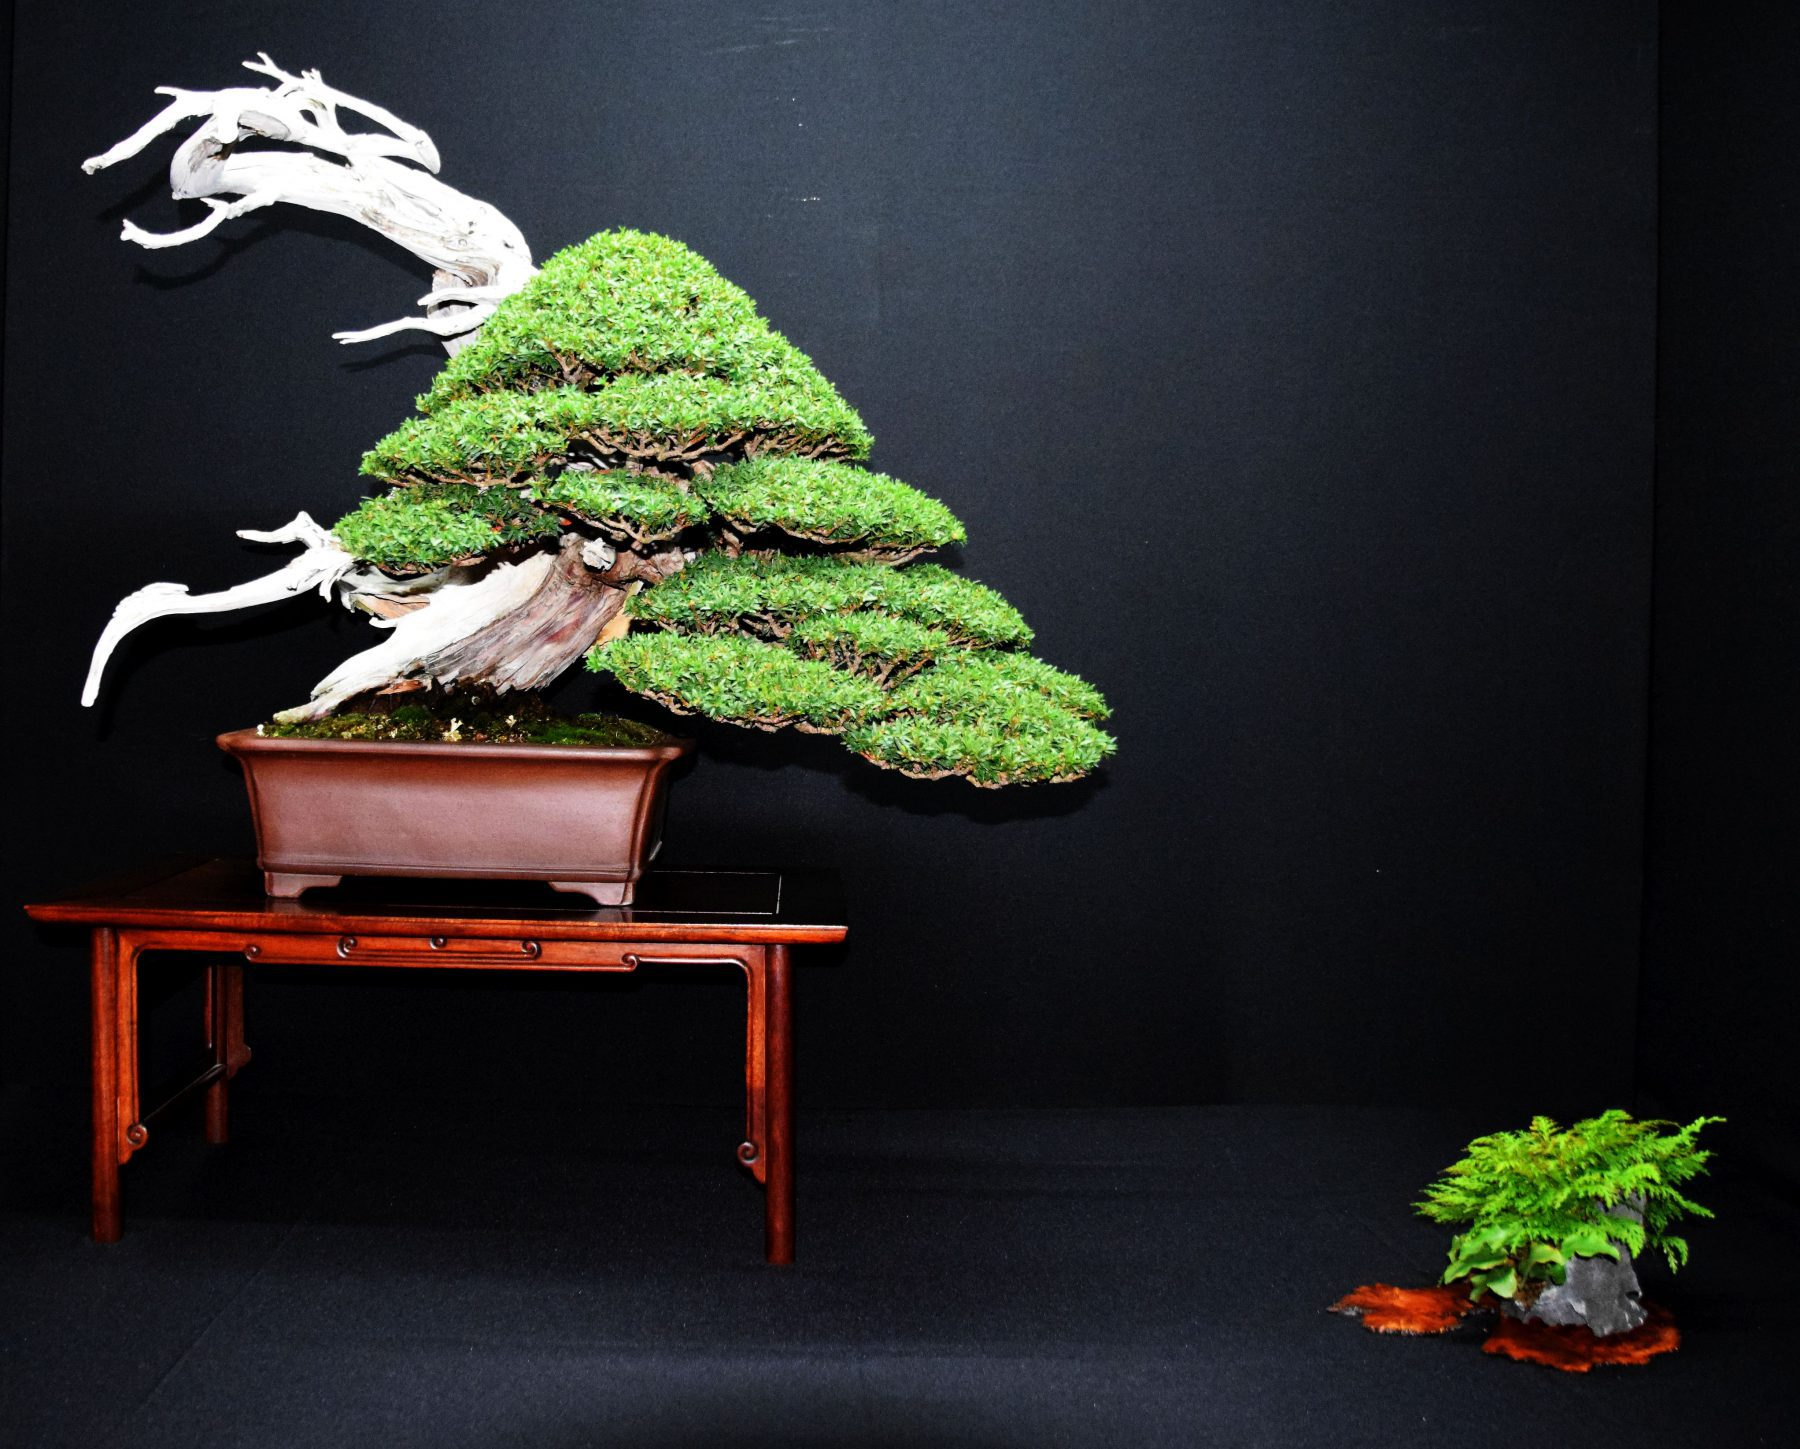 bonsai-museum-luis-vallejo-030